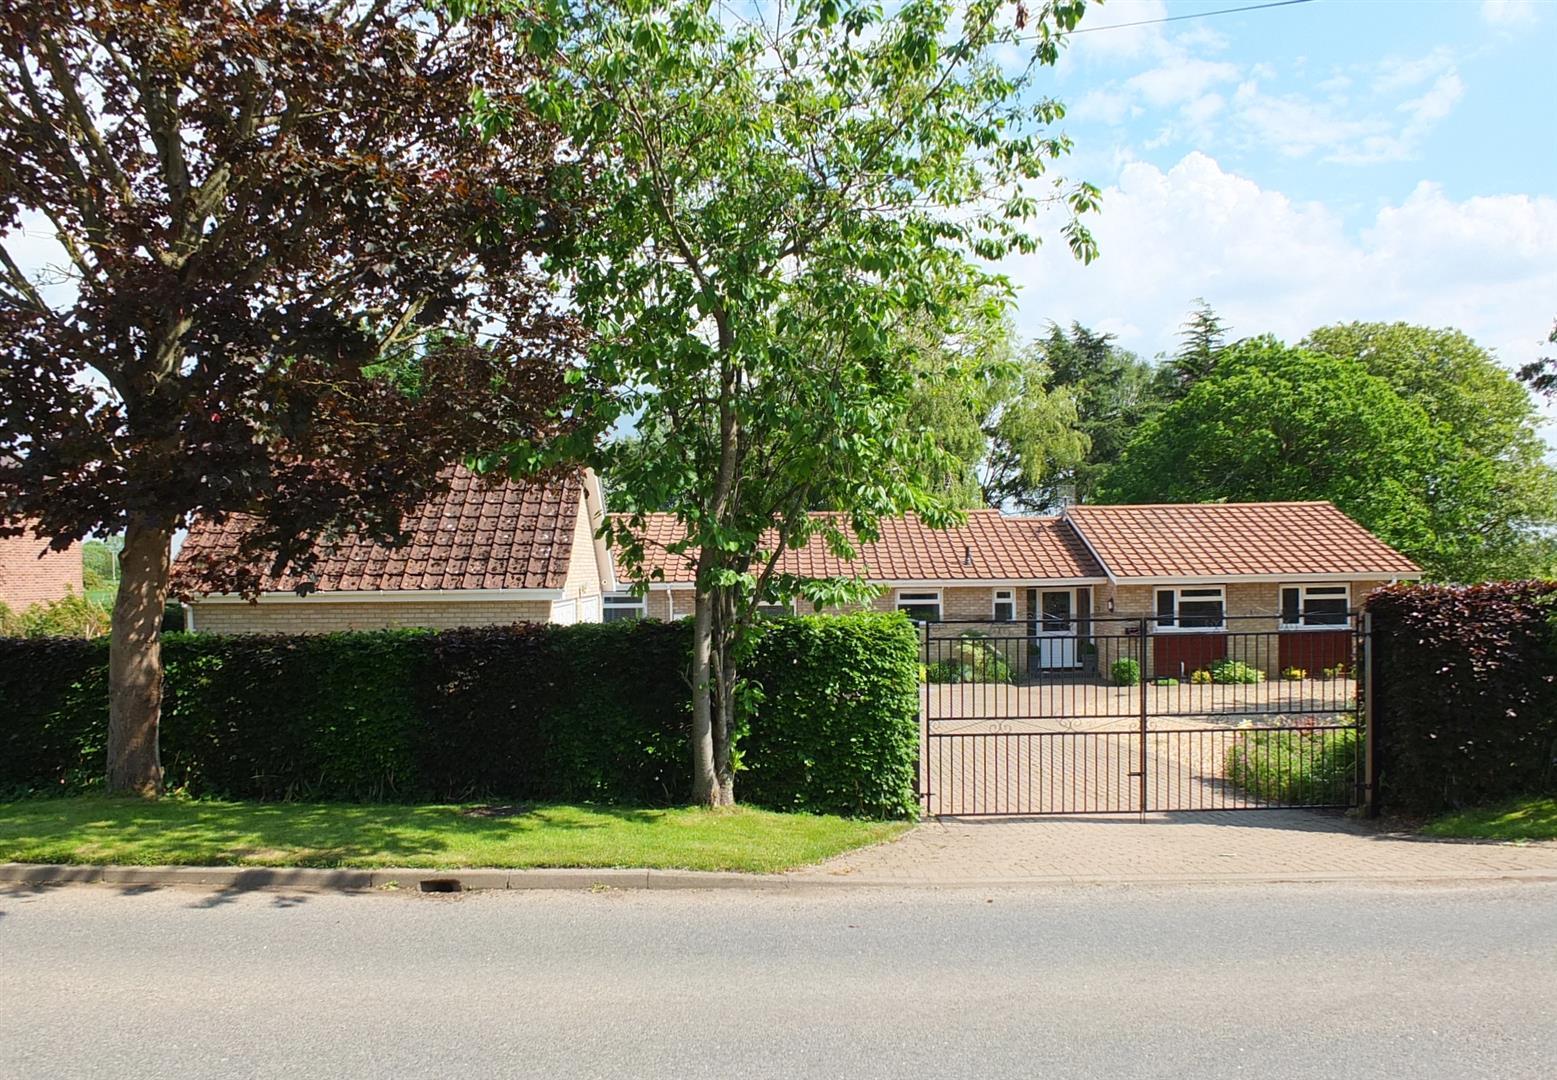 5 bed detached bungalow for sale in Main Street, Gedney Dyke Spalding, PE12